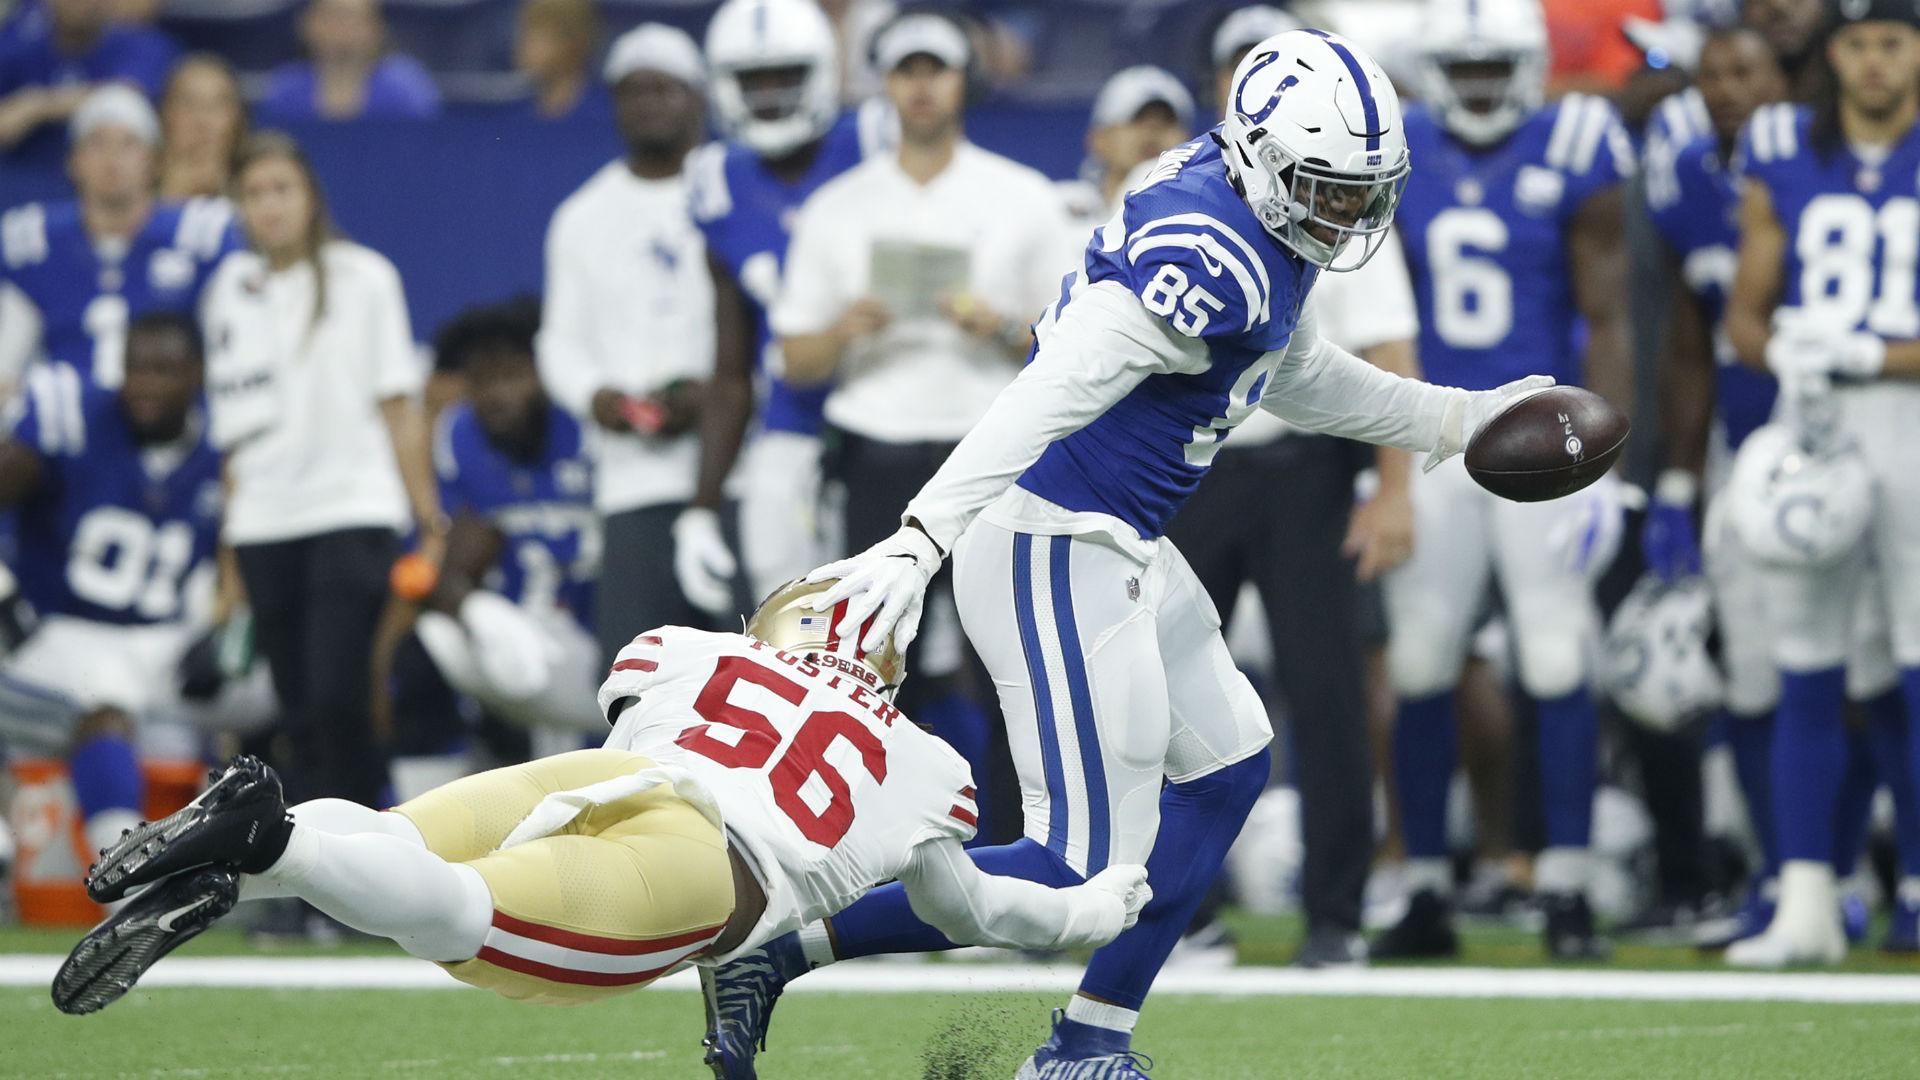 057ec17a7 49ers LB Reuben Foster suffers concussion vs. Colts